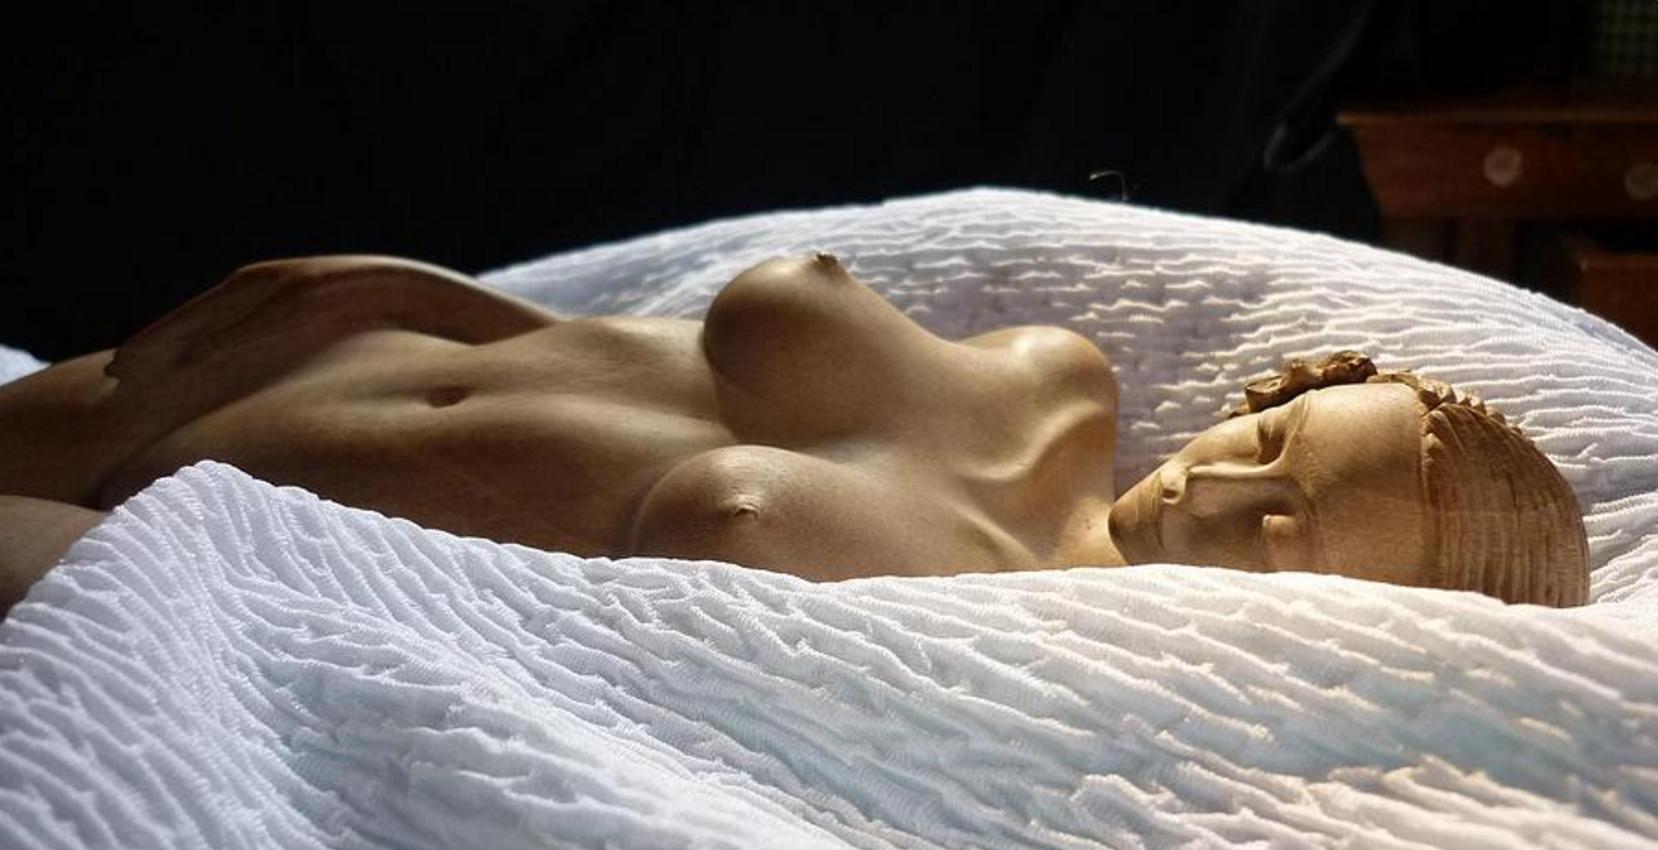 White Passion is a sculpture by Carlos Baez Barrueto